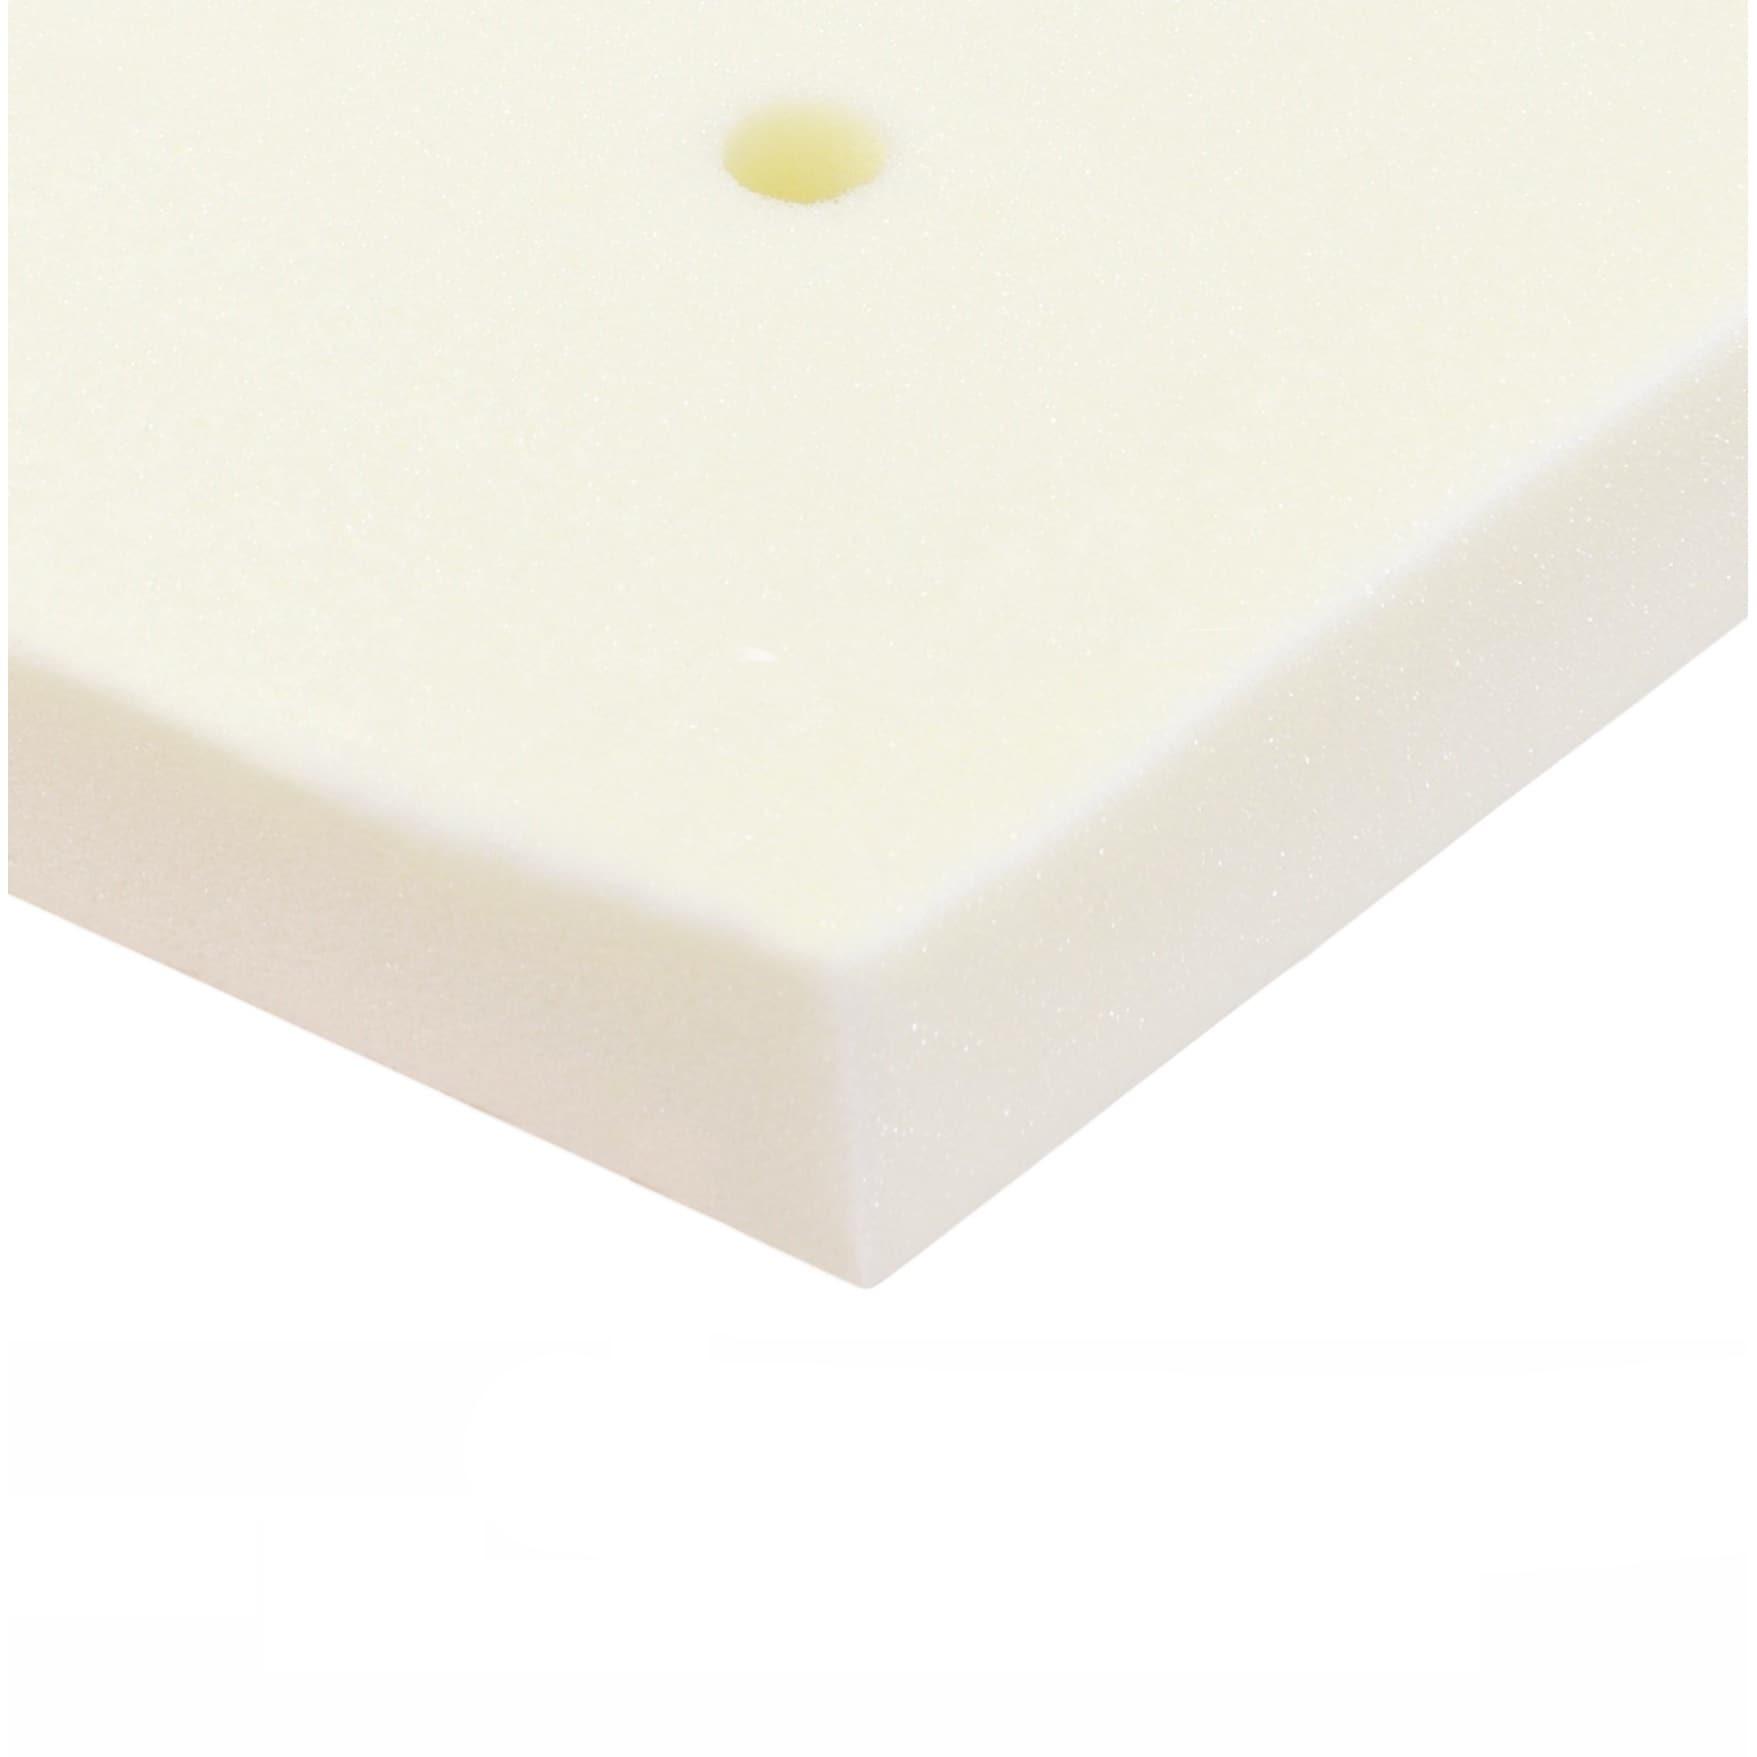 Superior 2-inch Ventilated High Density Memory Foam Mattr...